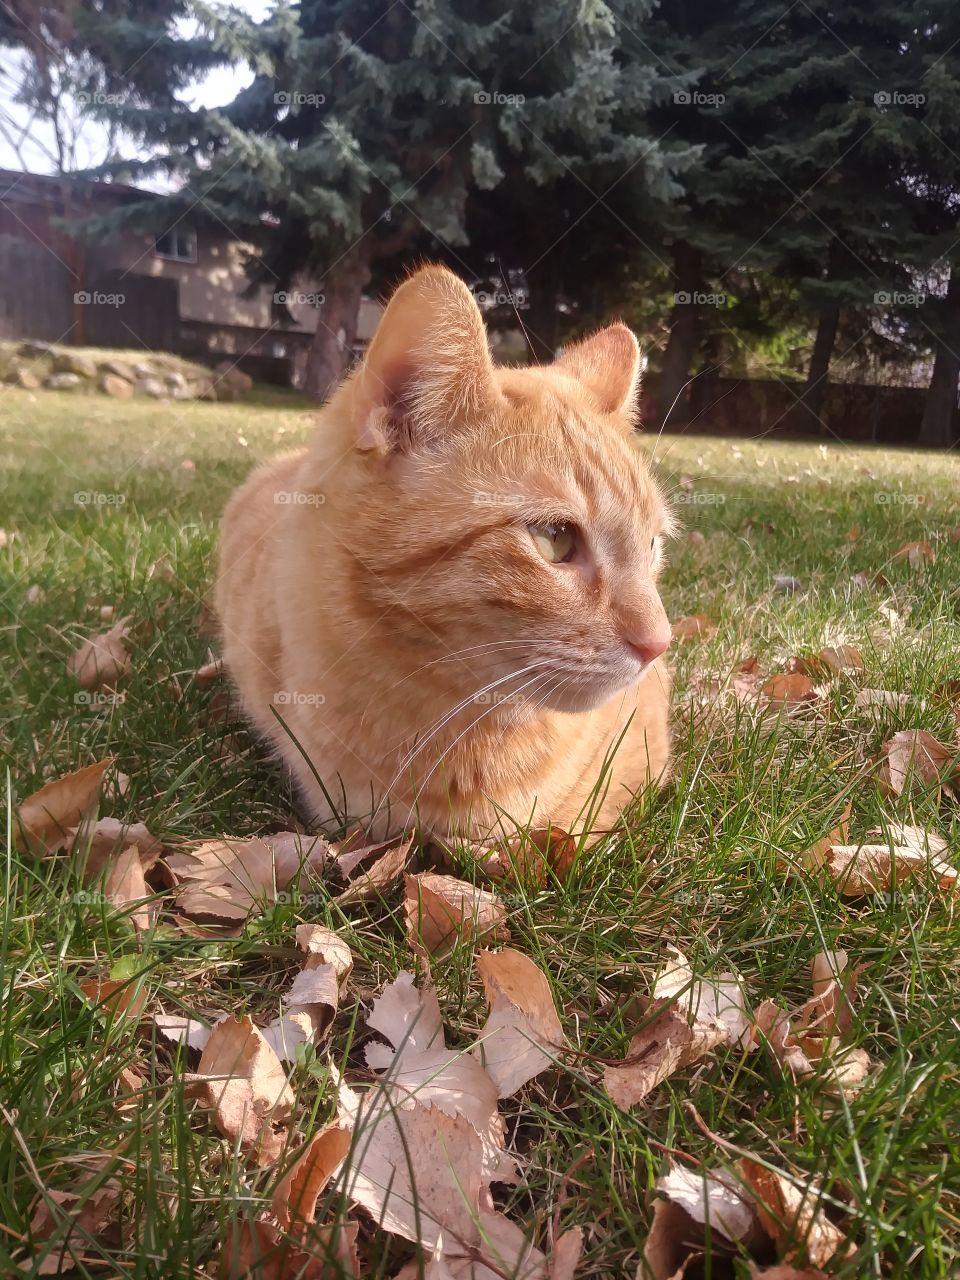 An orange cat named Butterbean in the grass 🐈